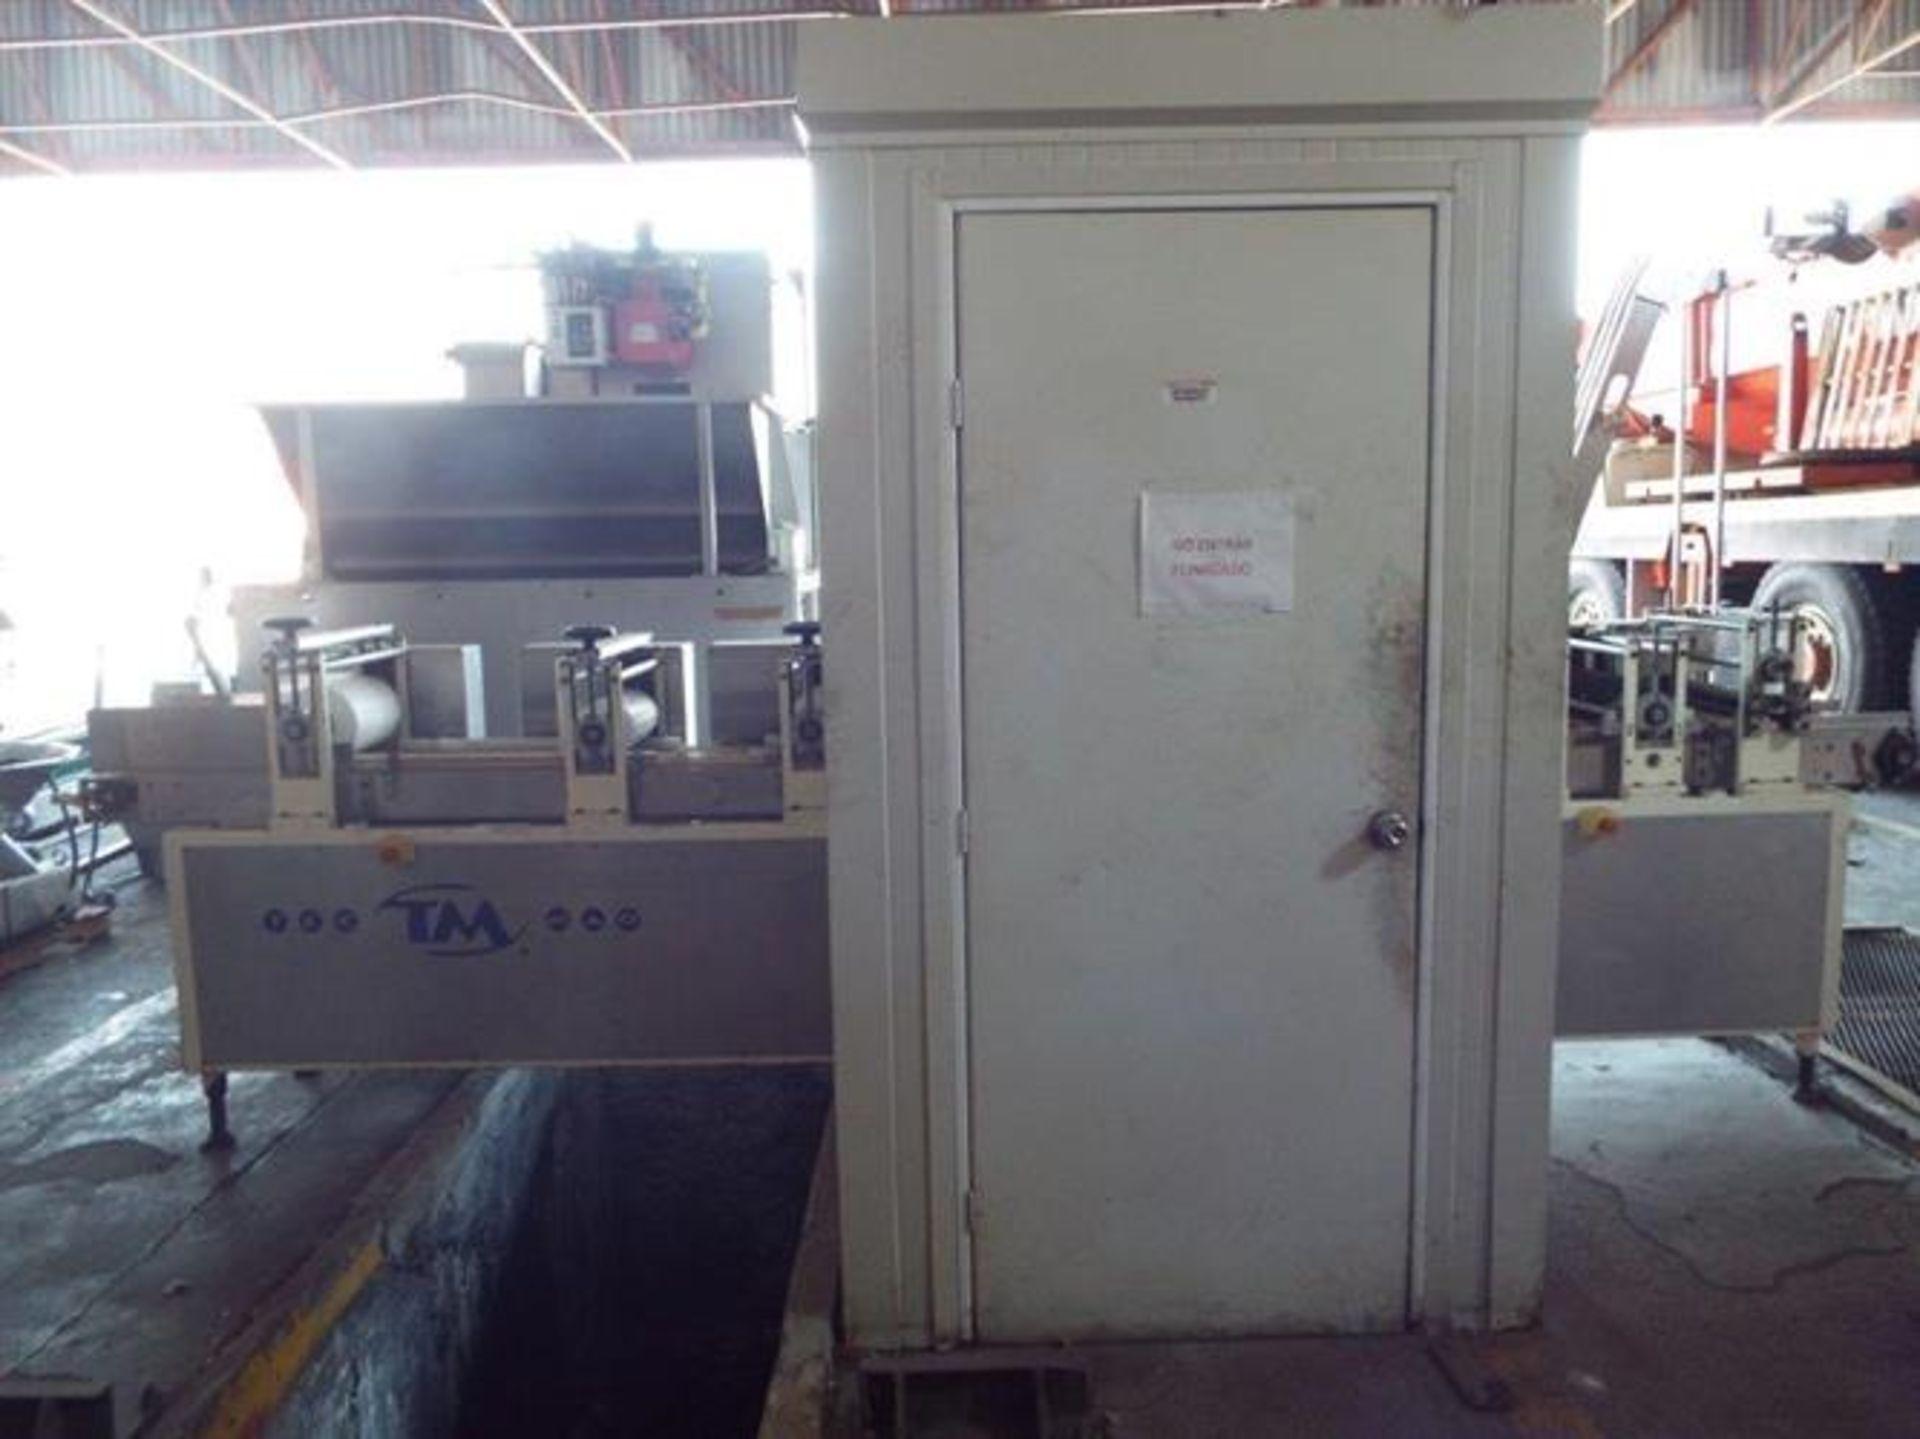 Tecmaq 290 mm Wide Slab Forming Line - Model TM-6H built 2012 - Three sets of gauging/sheeting - Image 2 of 30